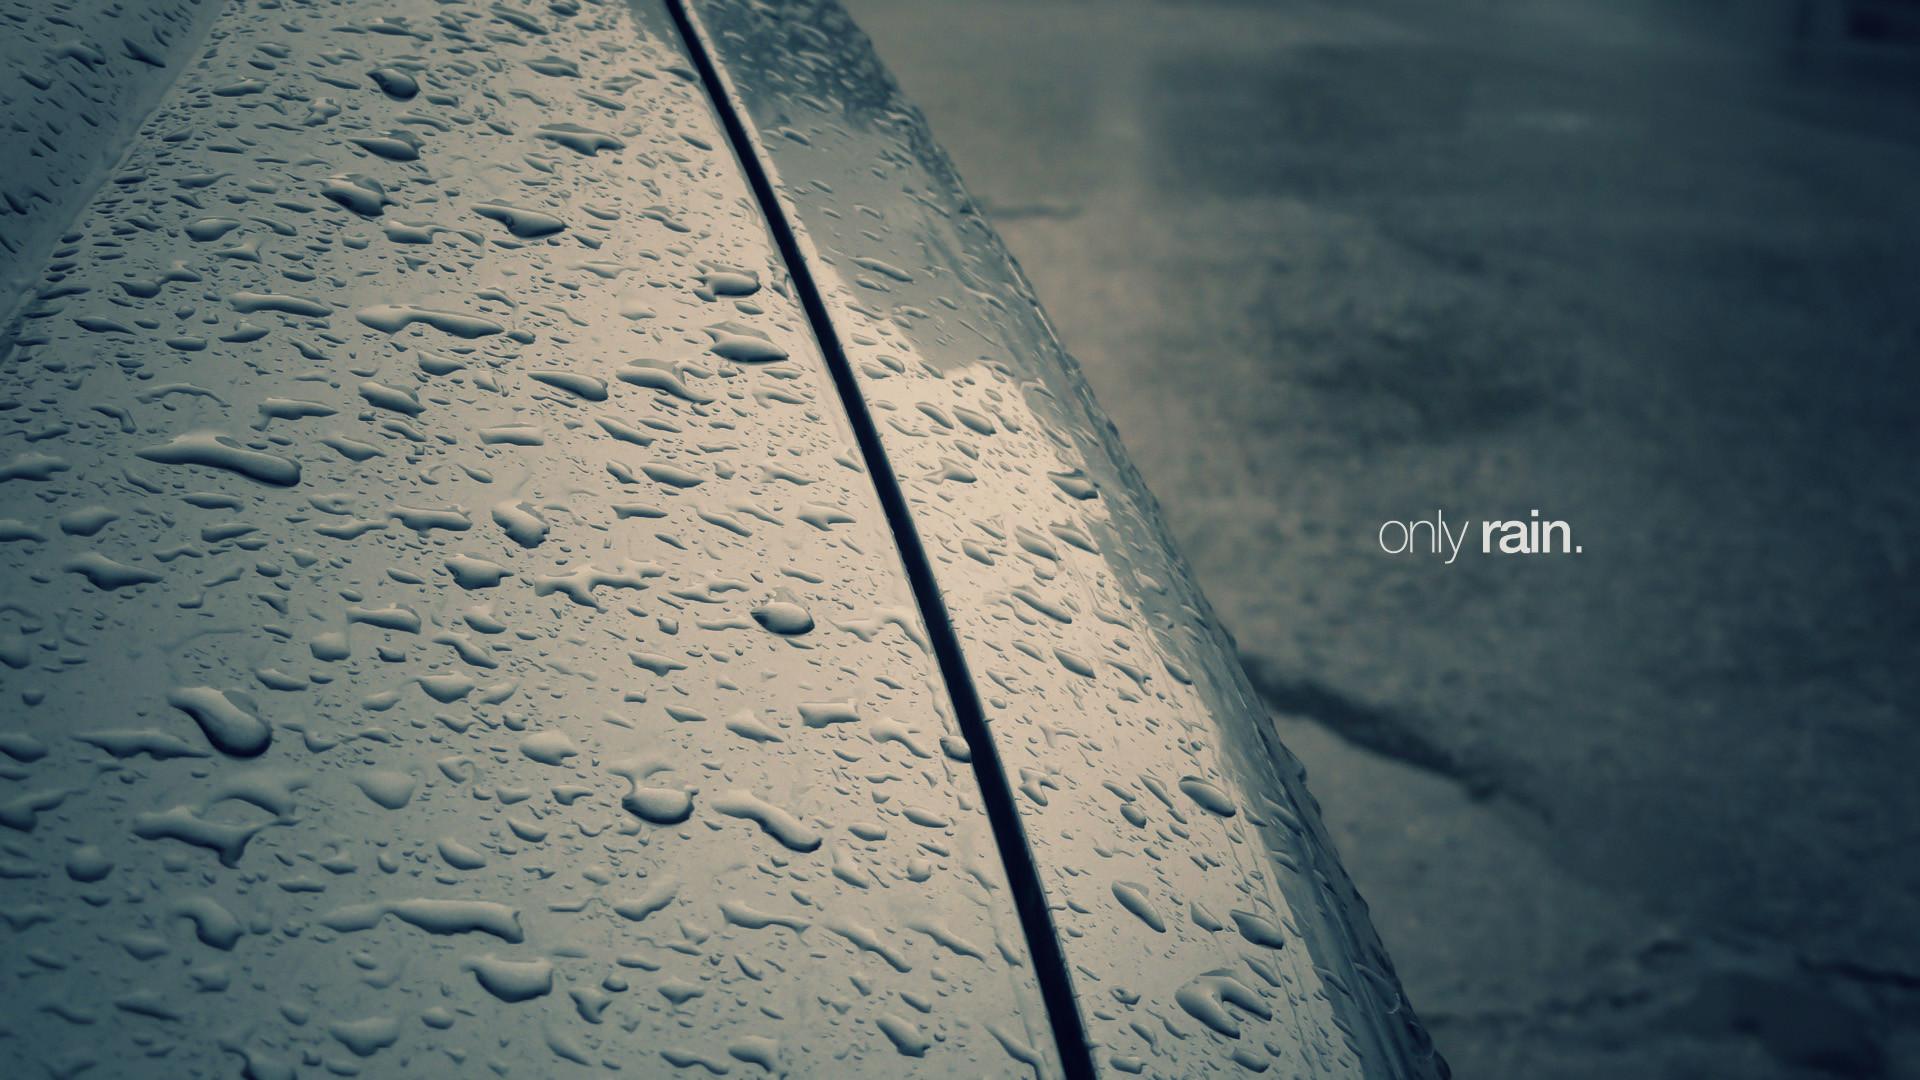 Rain Fall Hd Wallpaper Download Hd Rain Wallpapers 72 Images